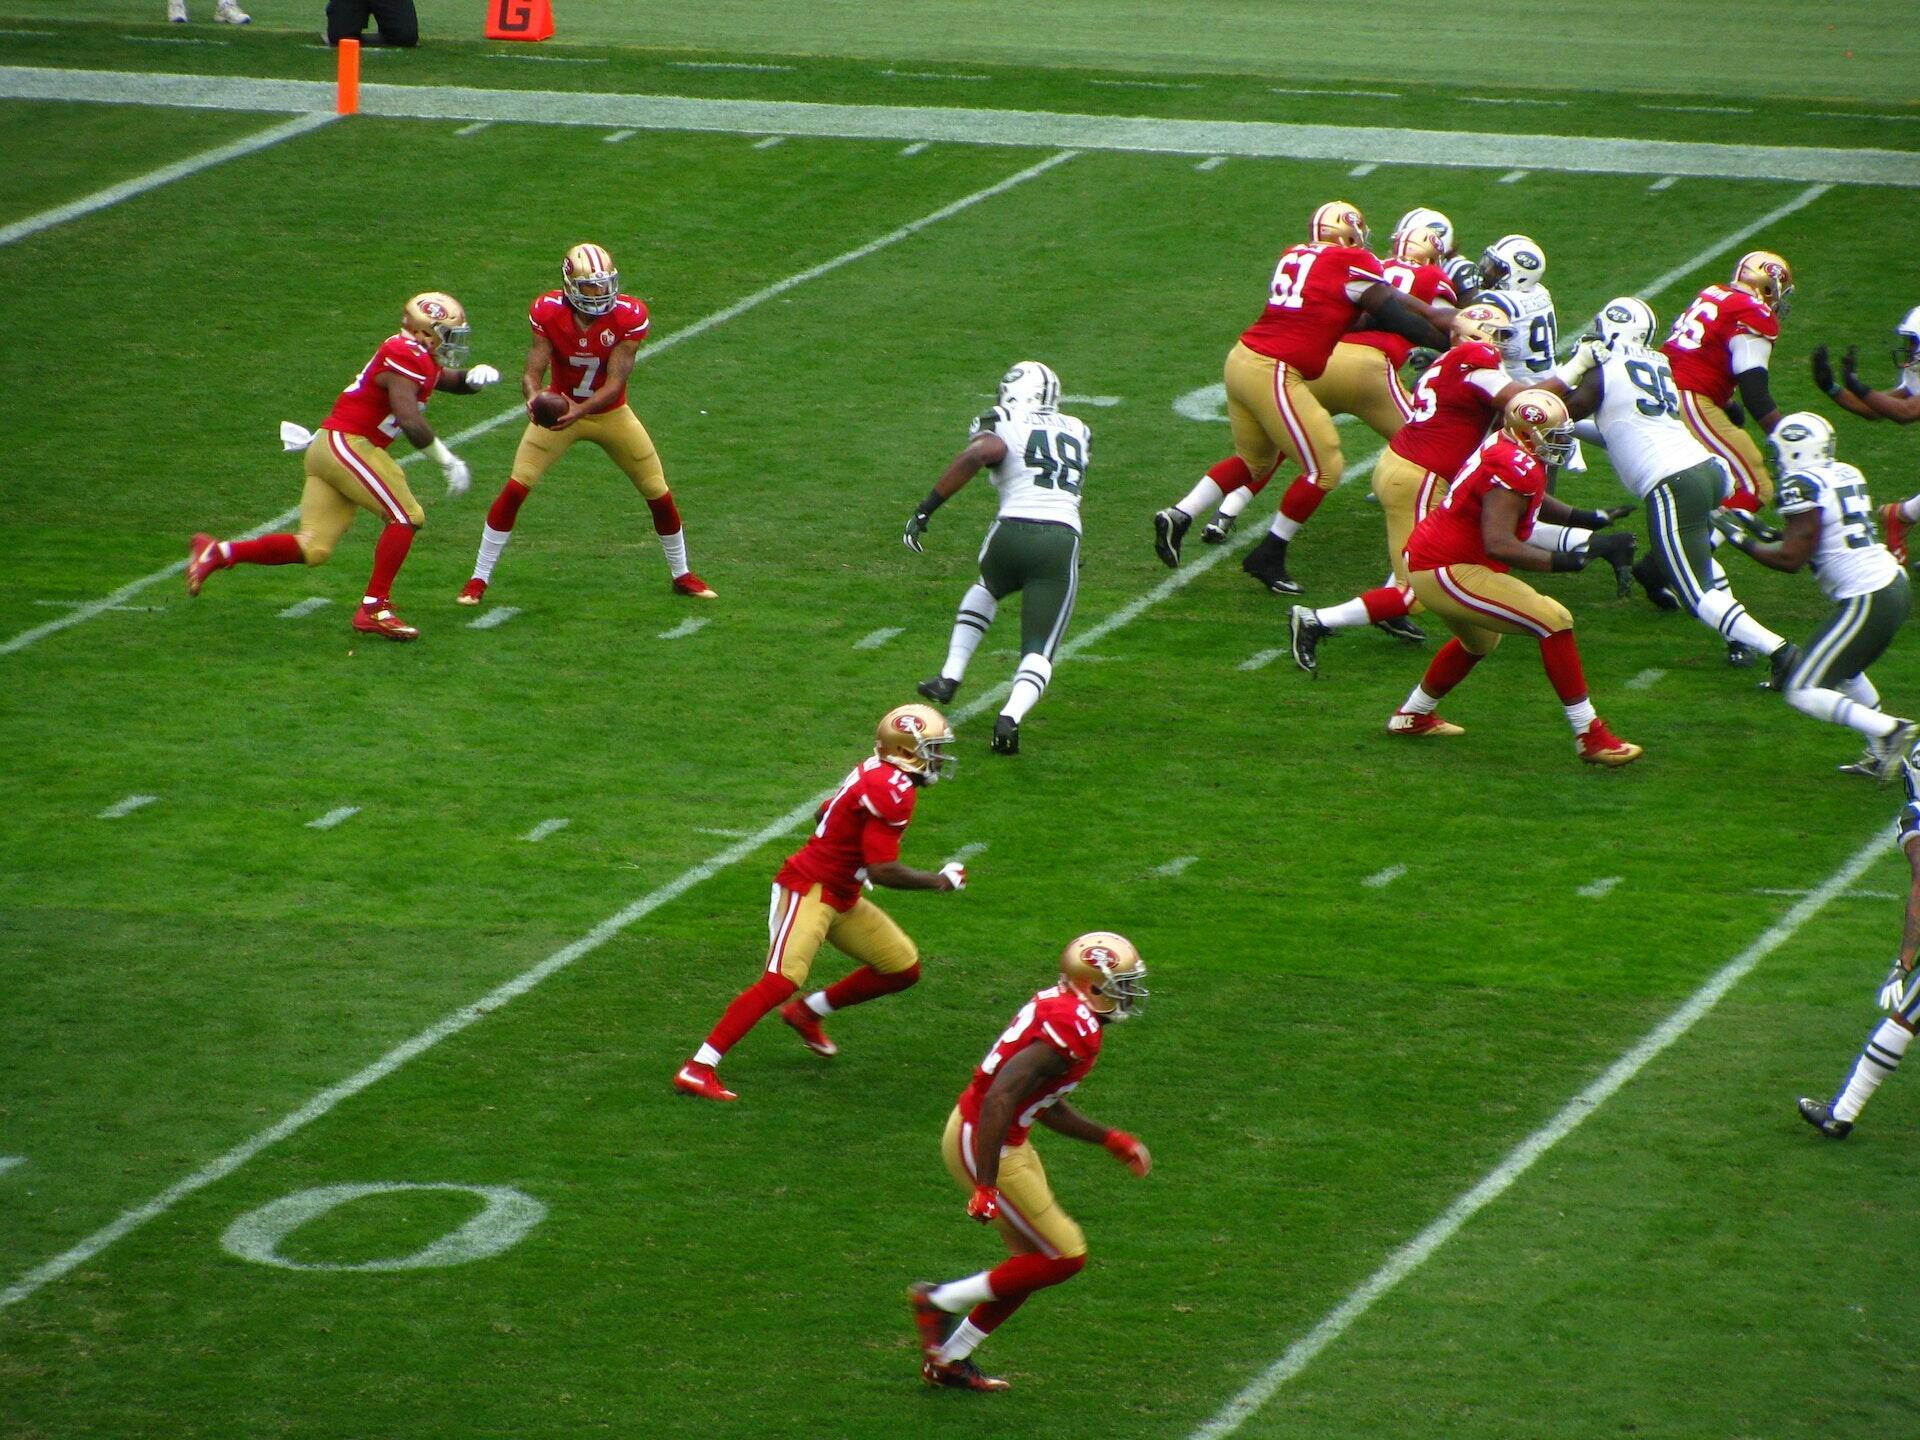 San Francisco 49ers at Levi's Stadium